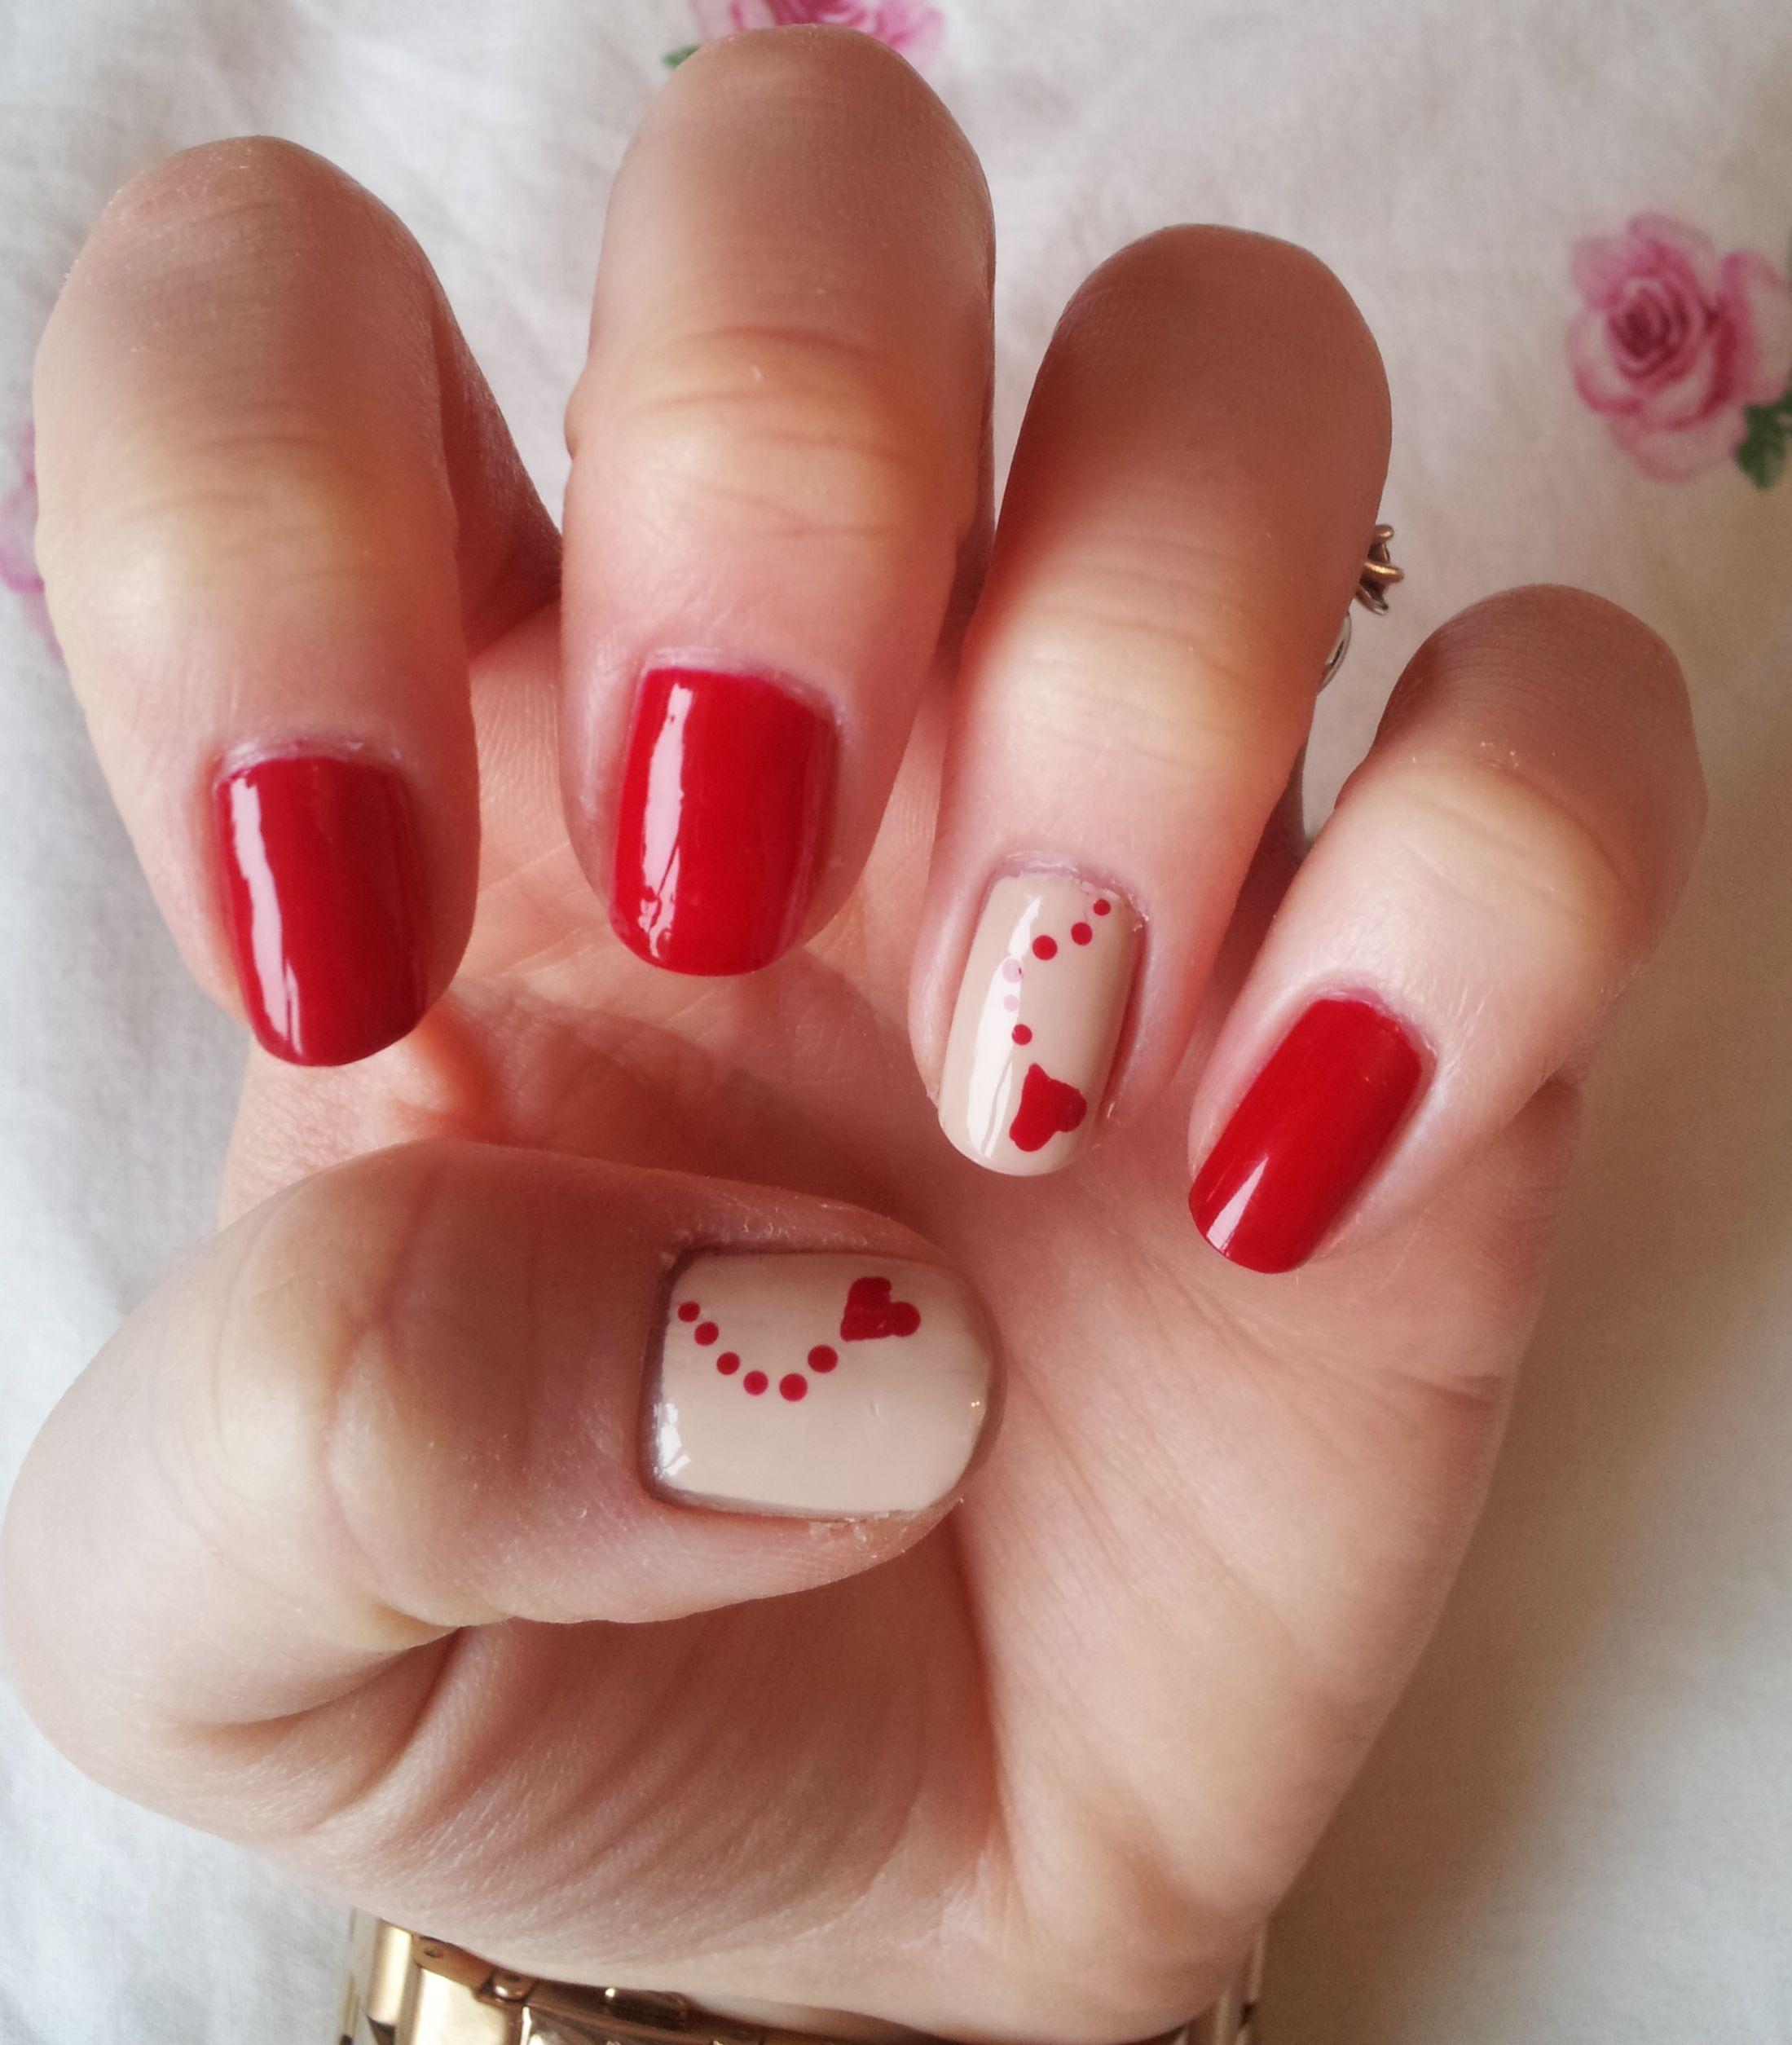 Romantic Nail Art By Rain Nailed It Pinterest Romantic Nails